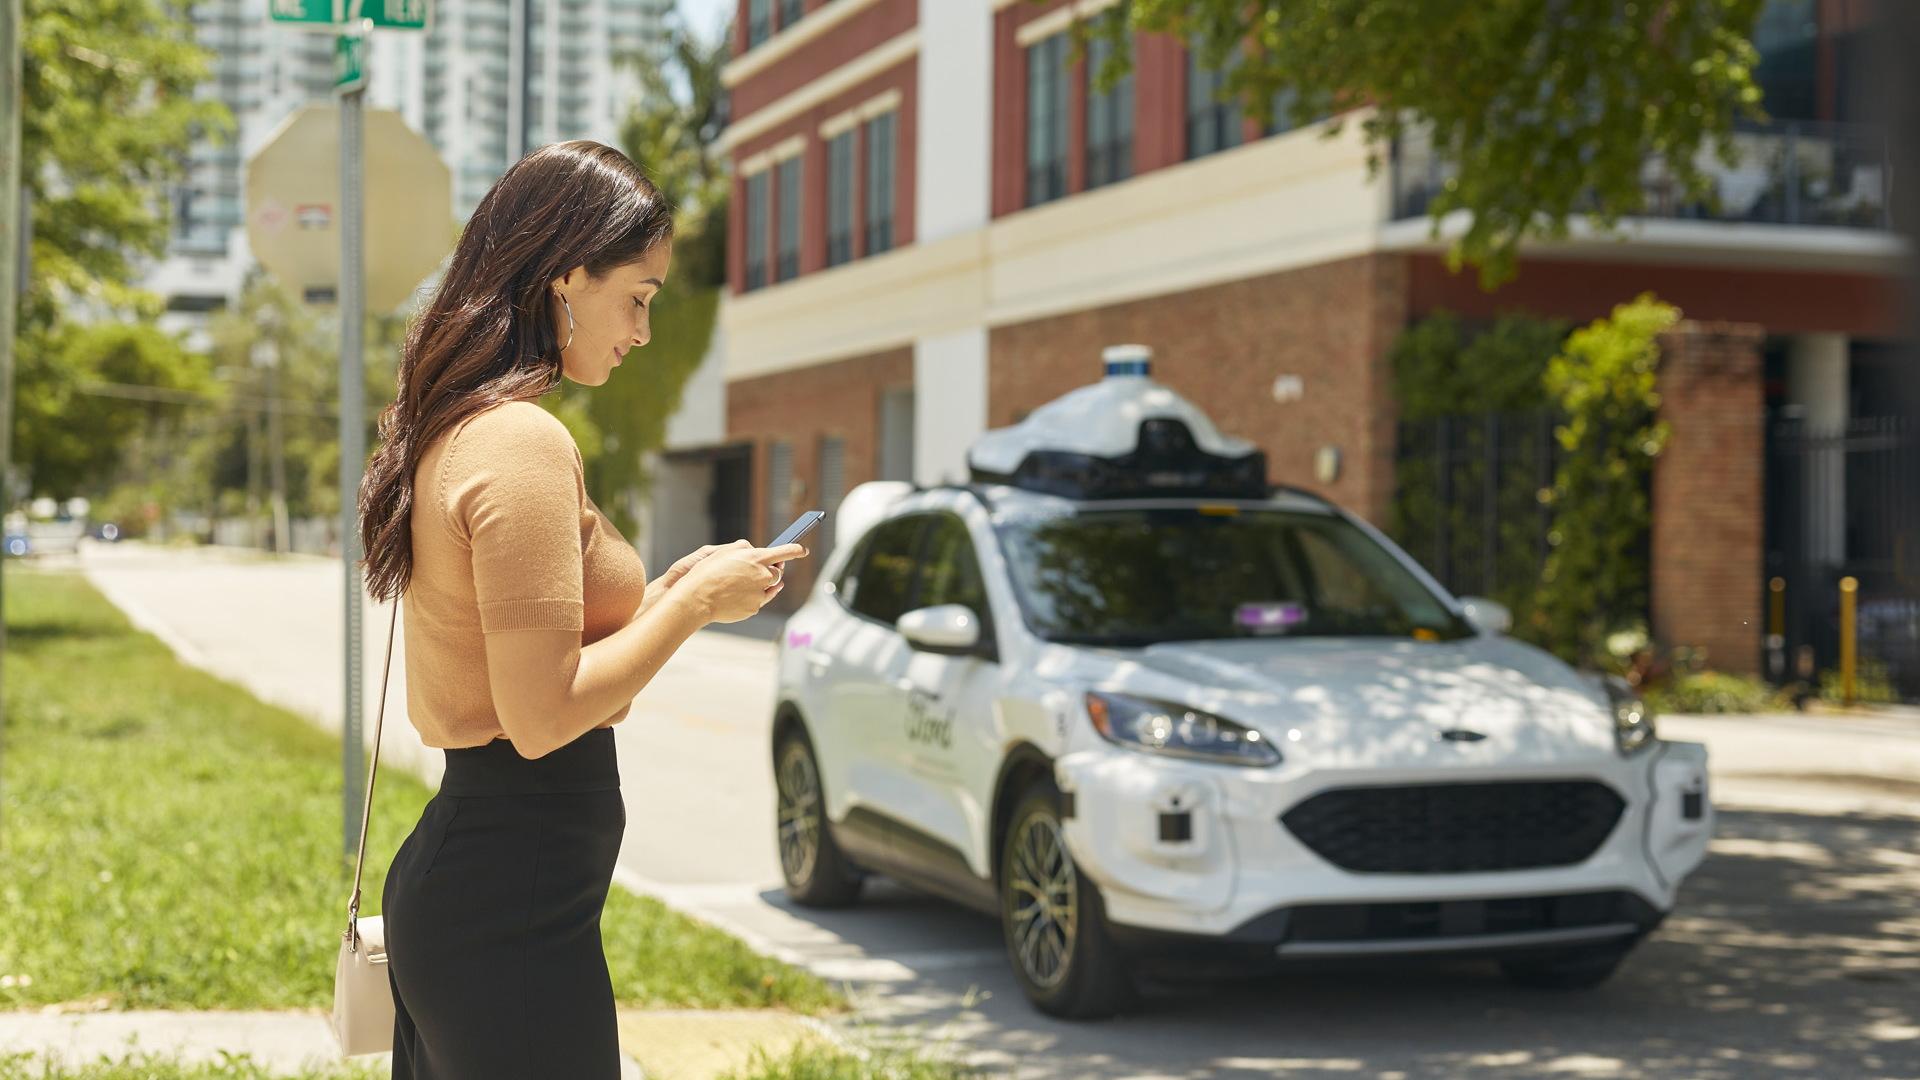 Argo AI self-driving car to join Lyft's fleet in Miami, Florida